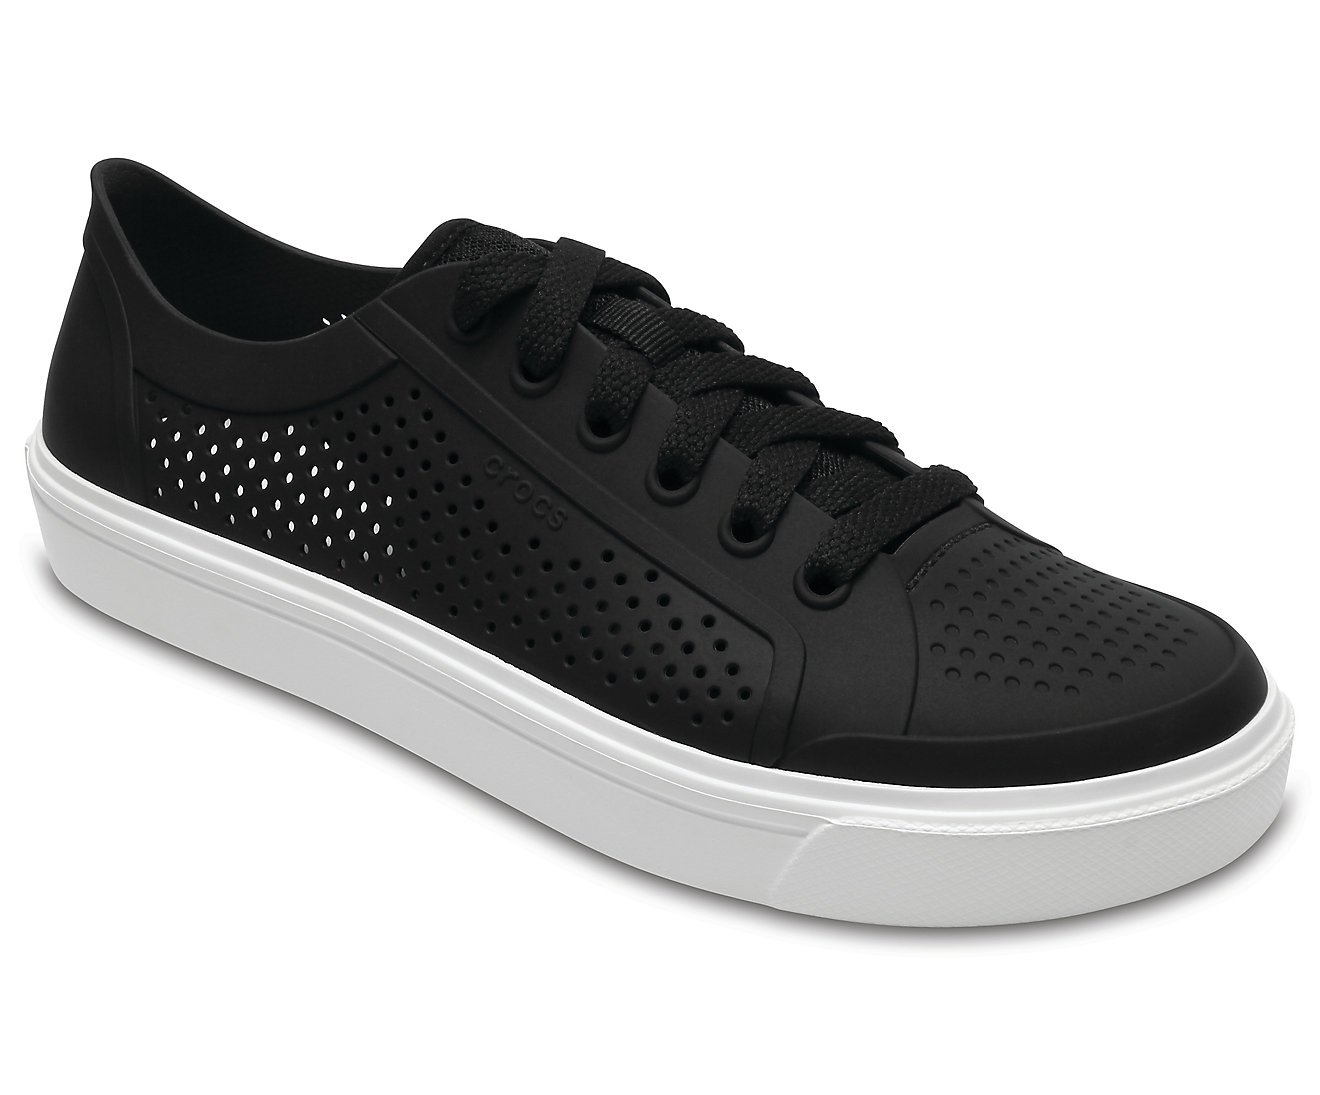 Crocs Womens Citi Lane Roka Court Clog Shoes, Size: 4 B(M) US Womens, Color Black